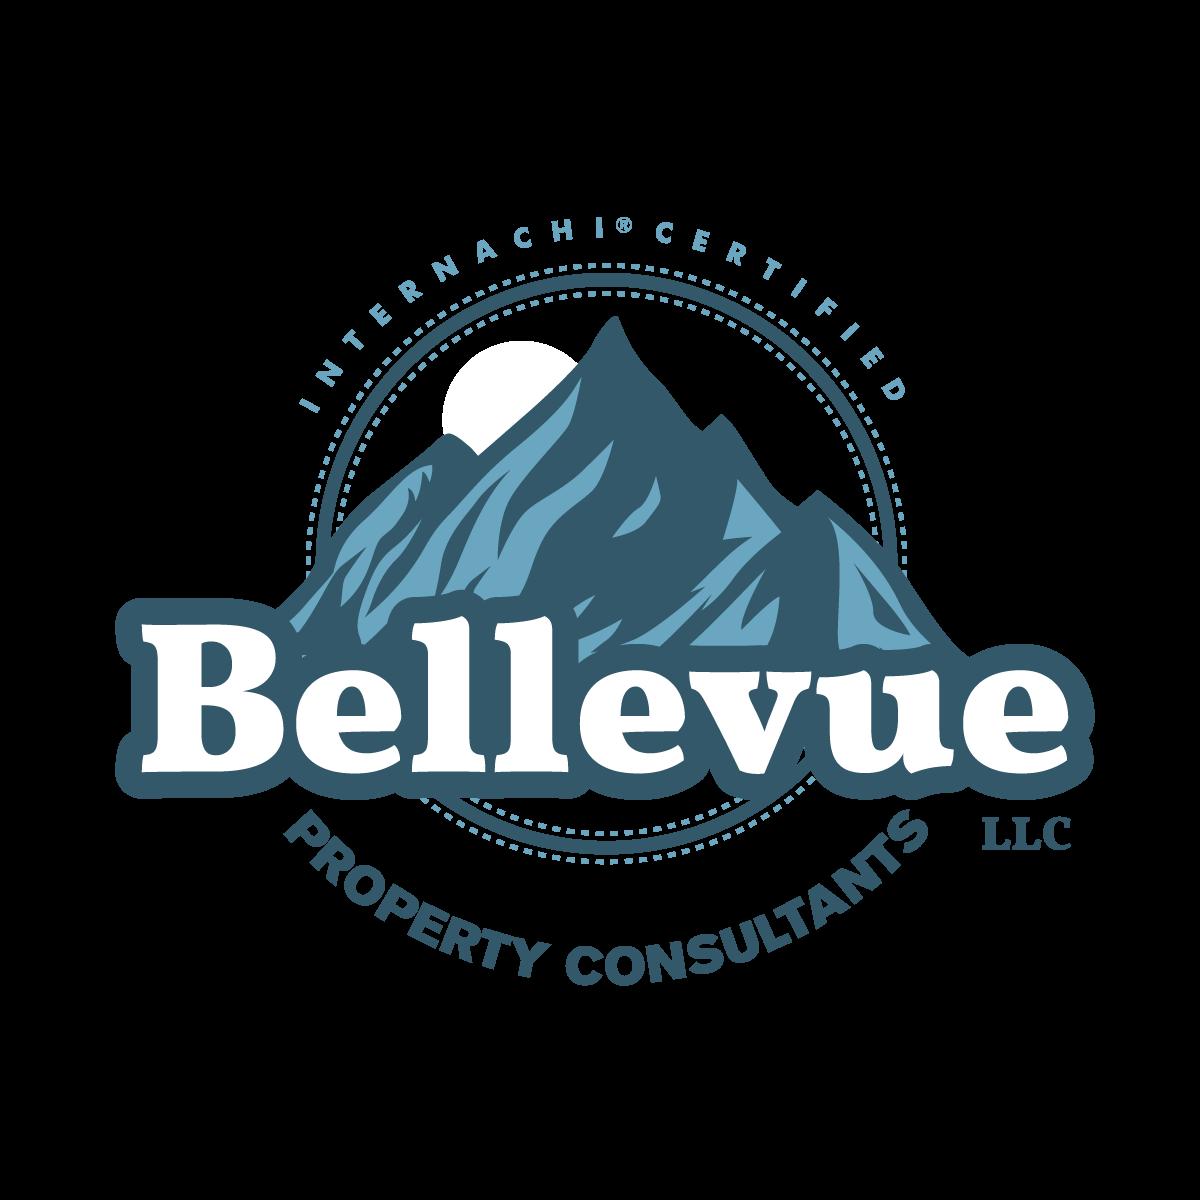 Bellevue logo update transparent